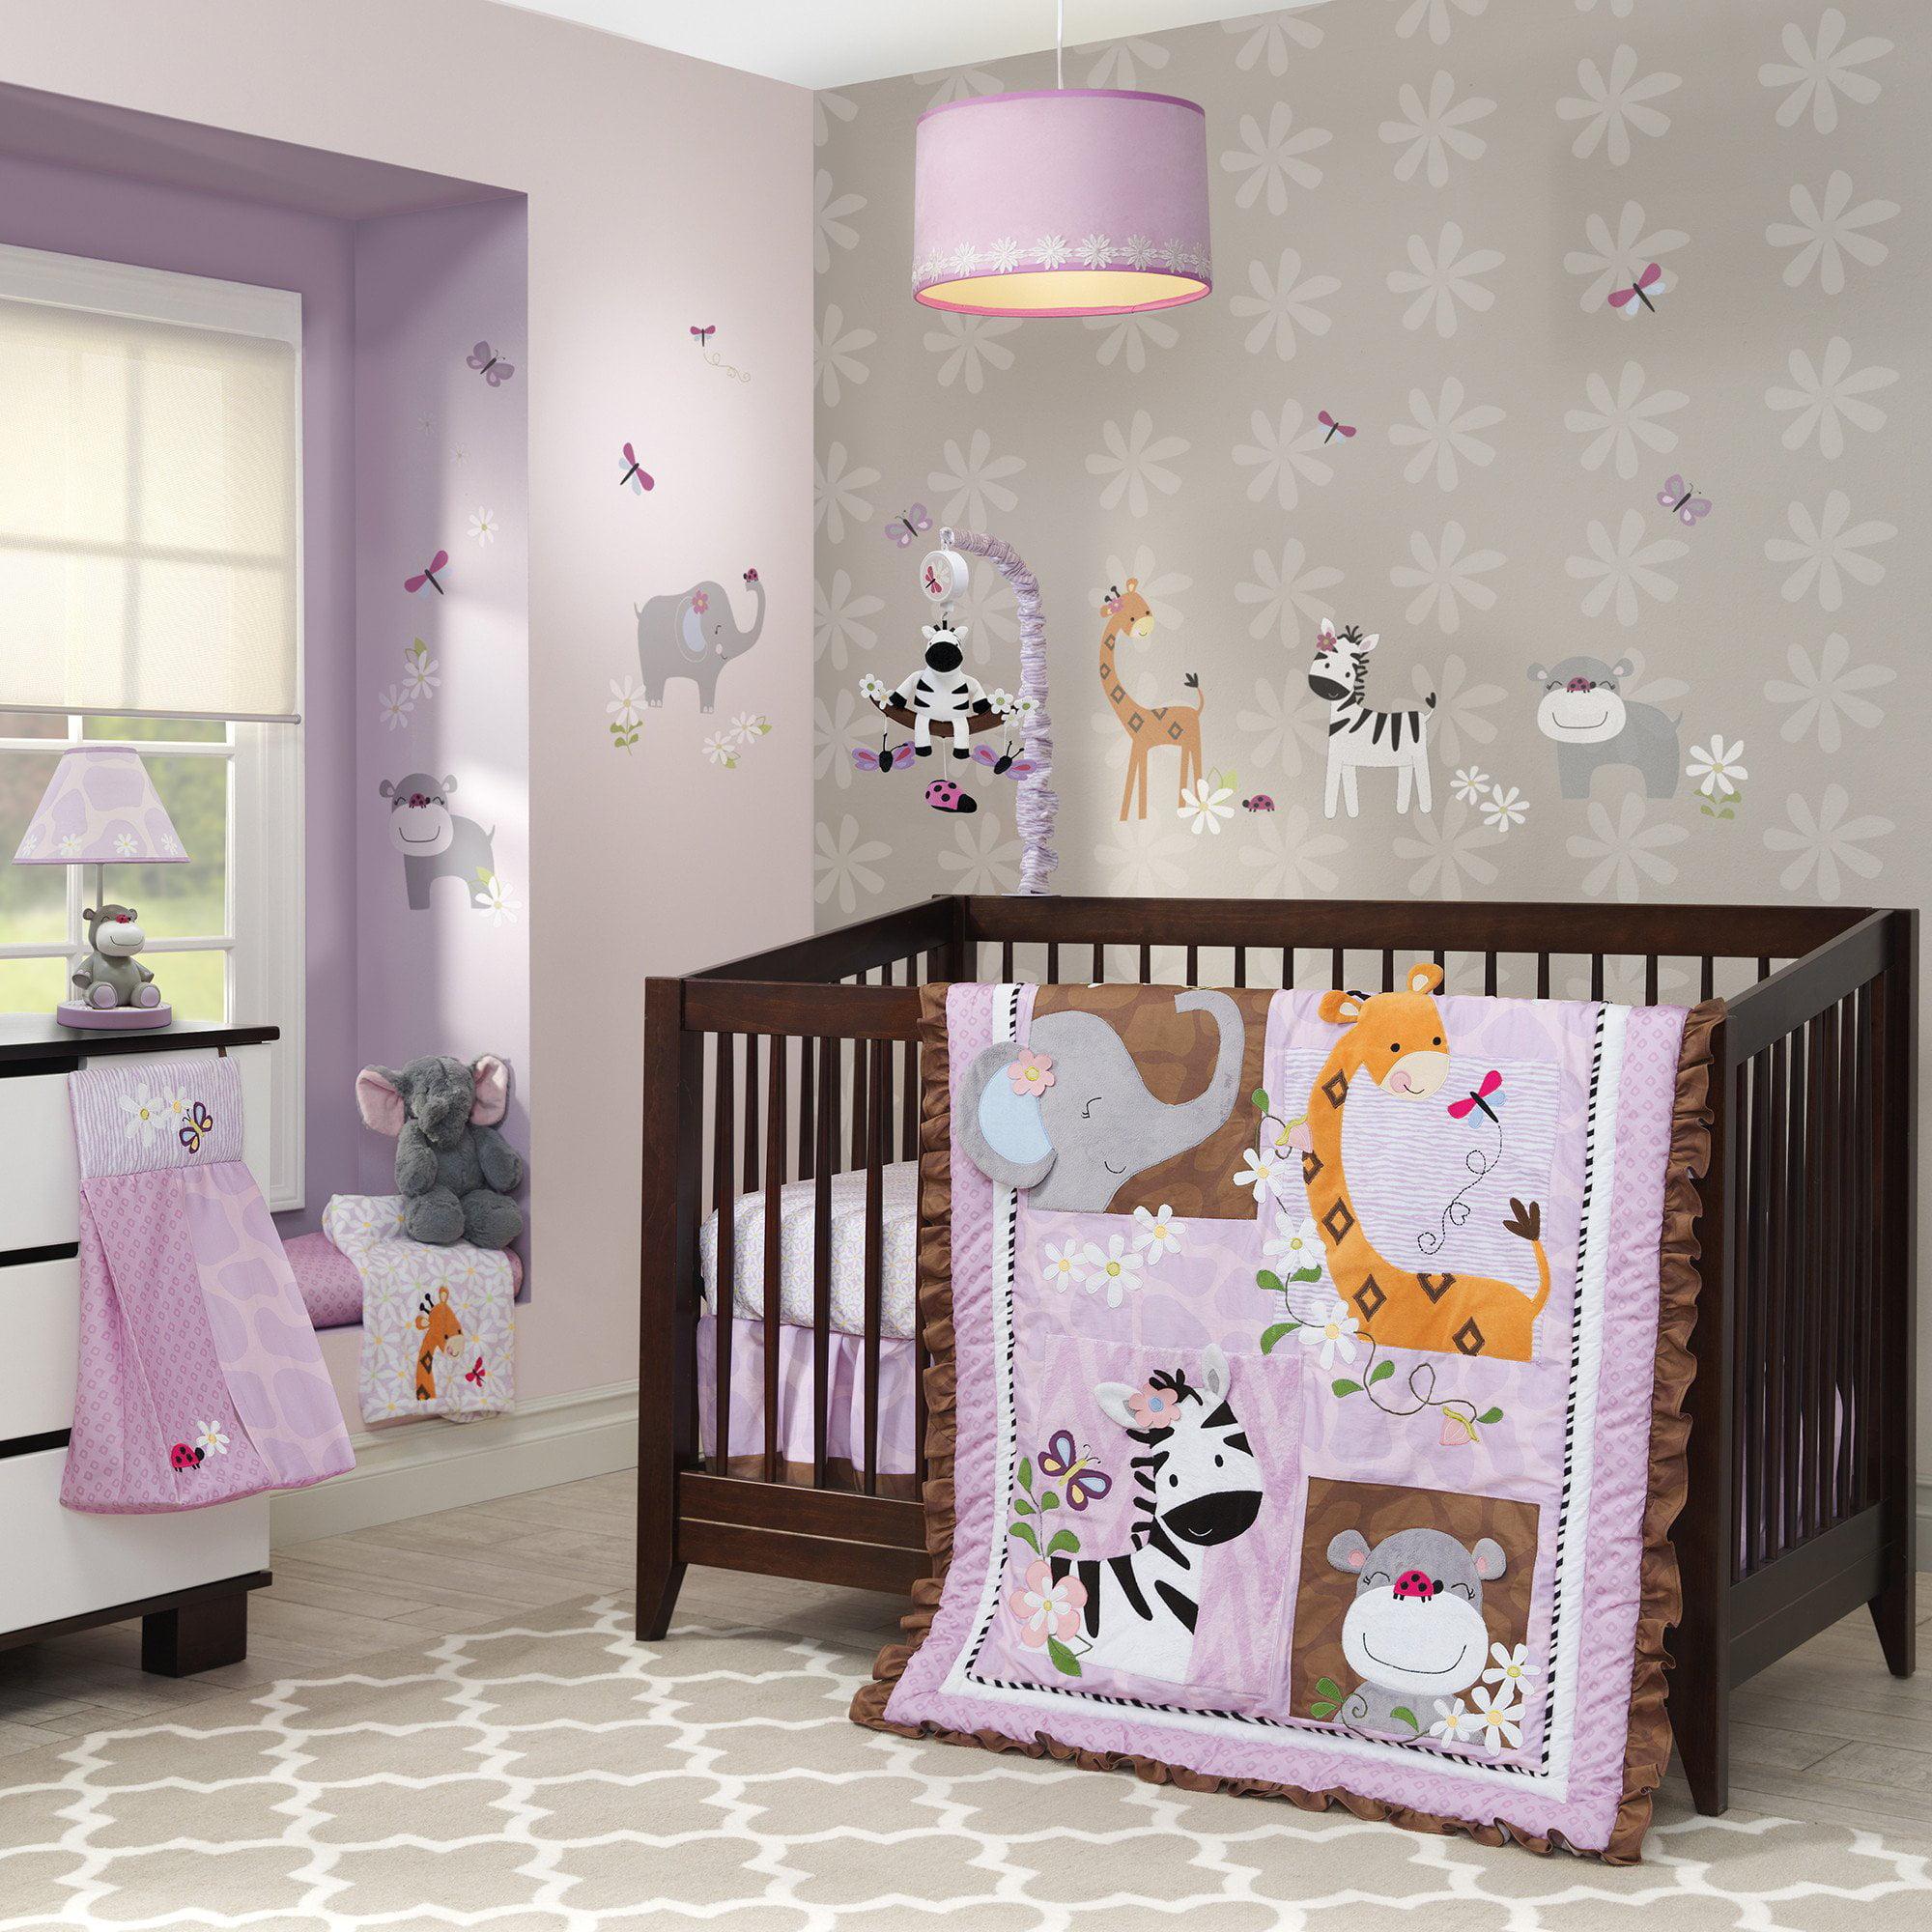 Lambs & Ivy Ladybug Jungle 4-Piece Crib Bedding Set - Brown, Purple, Animals